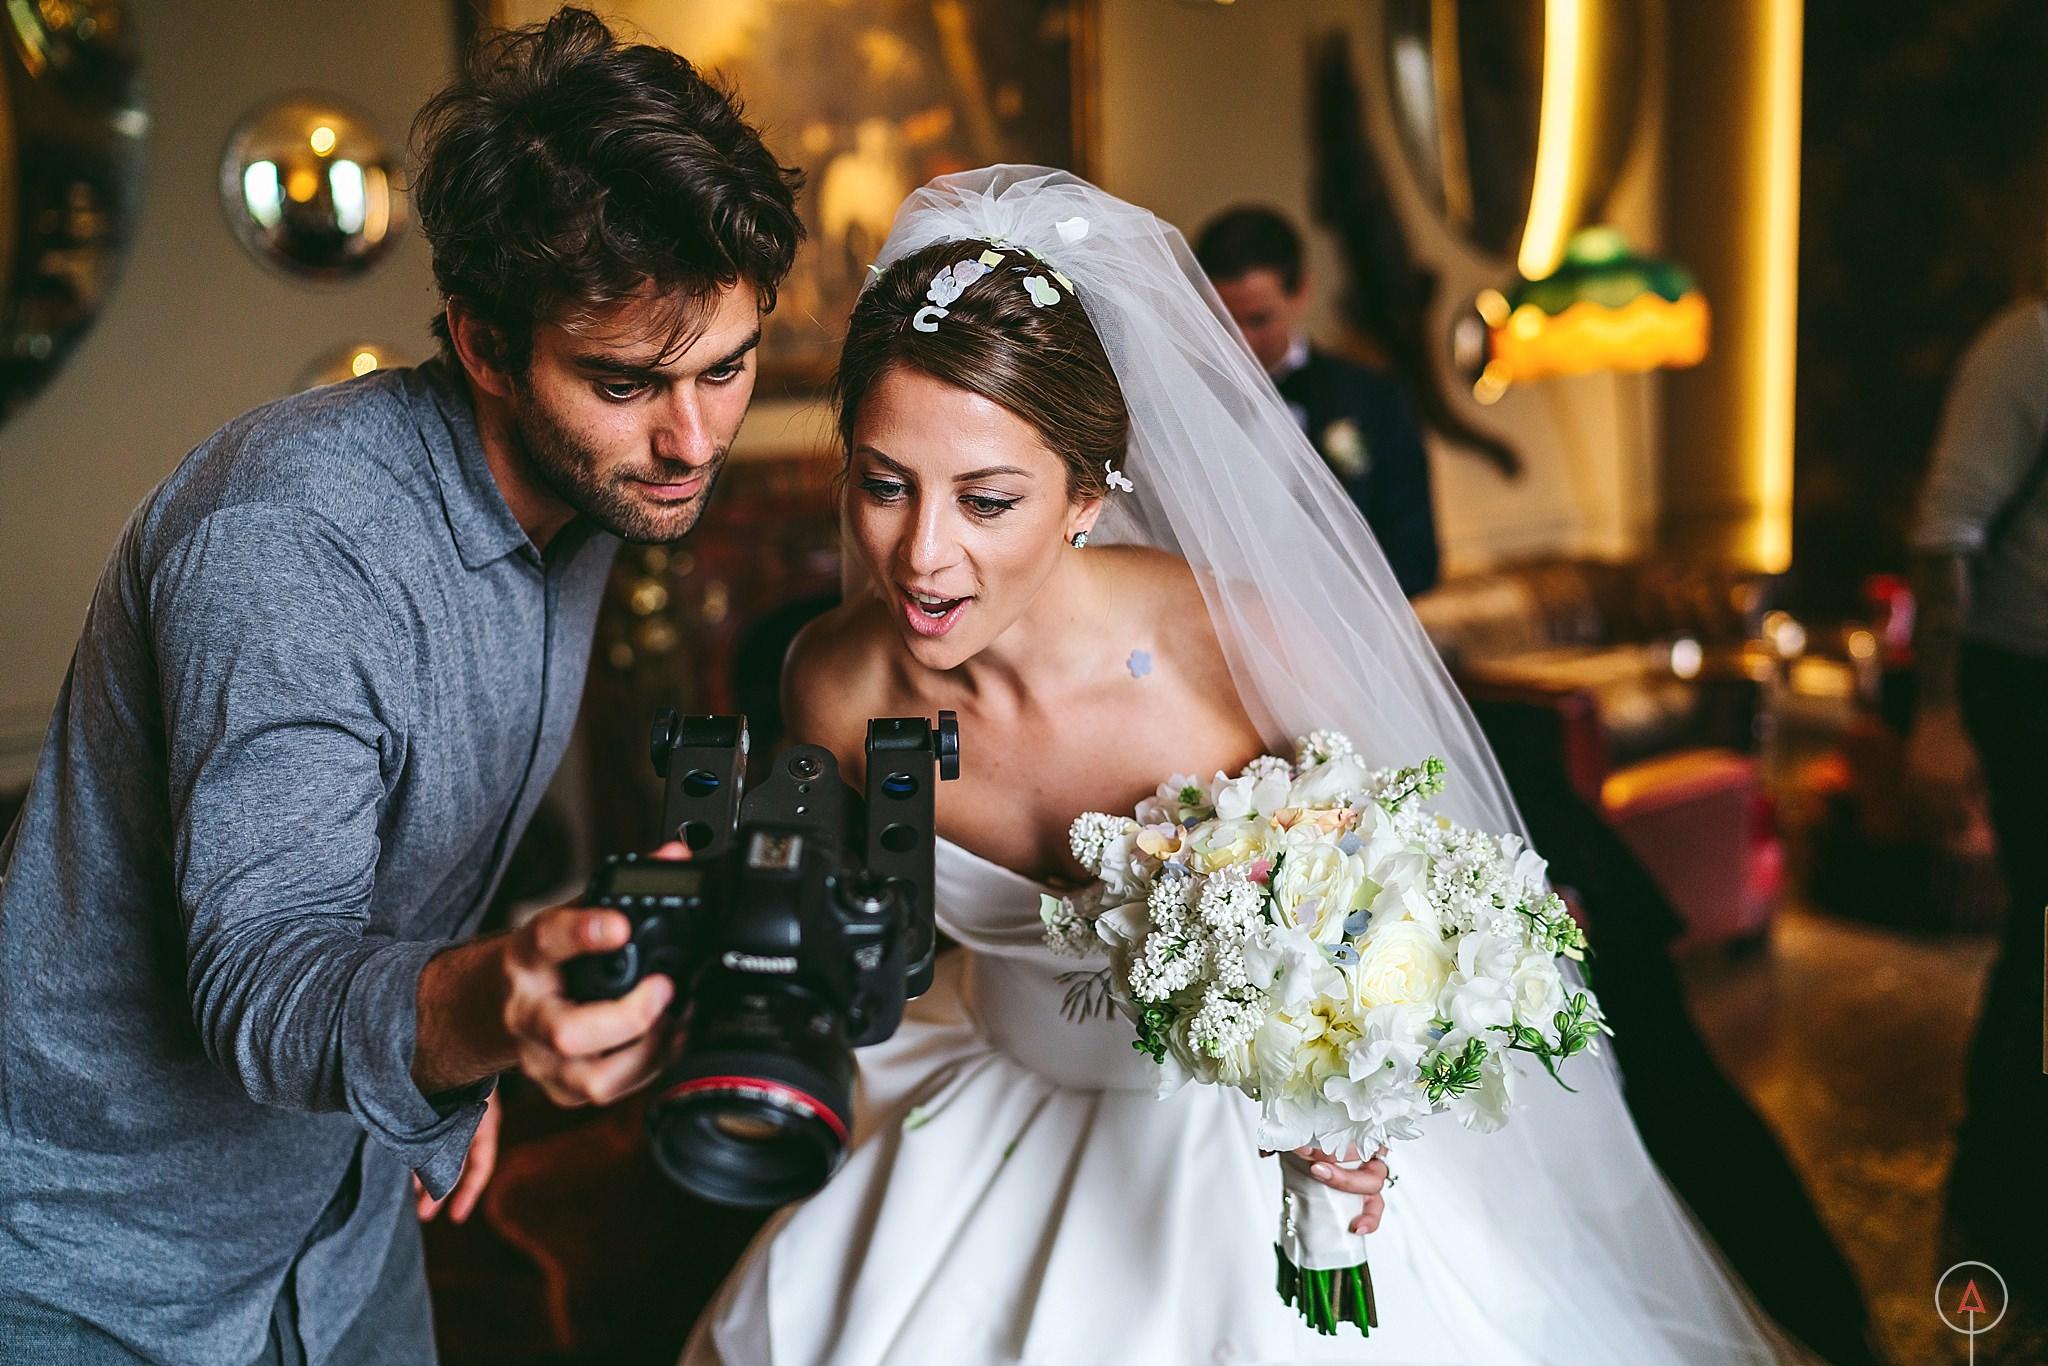 cardiff-wedding-photographer-aga-tomaszek_0275